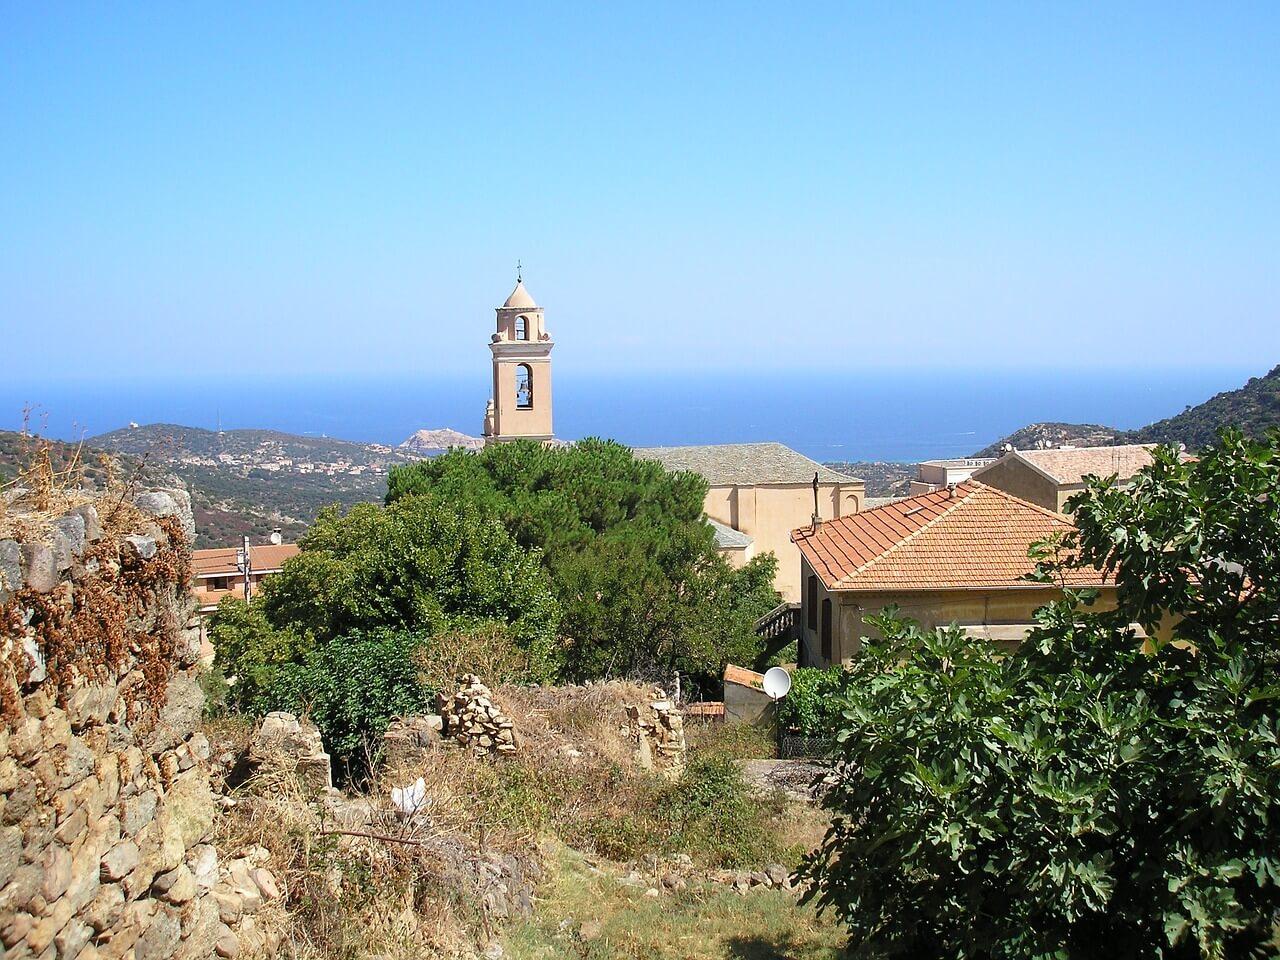 Outdoor paradise Balagne on Corsica.